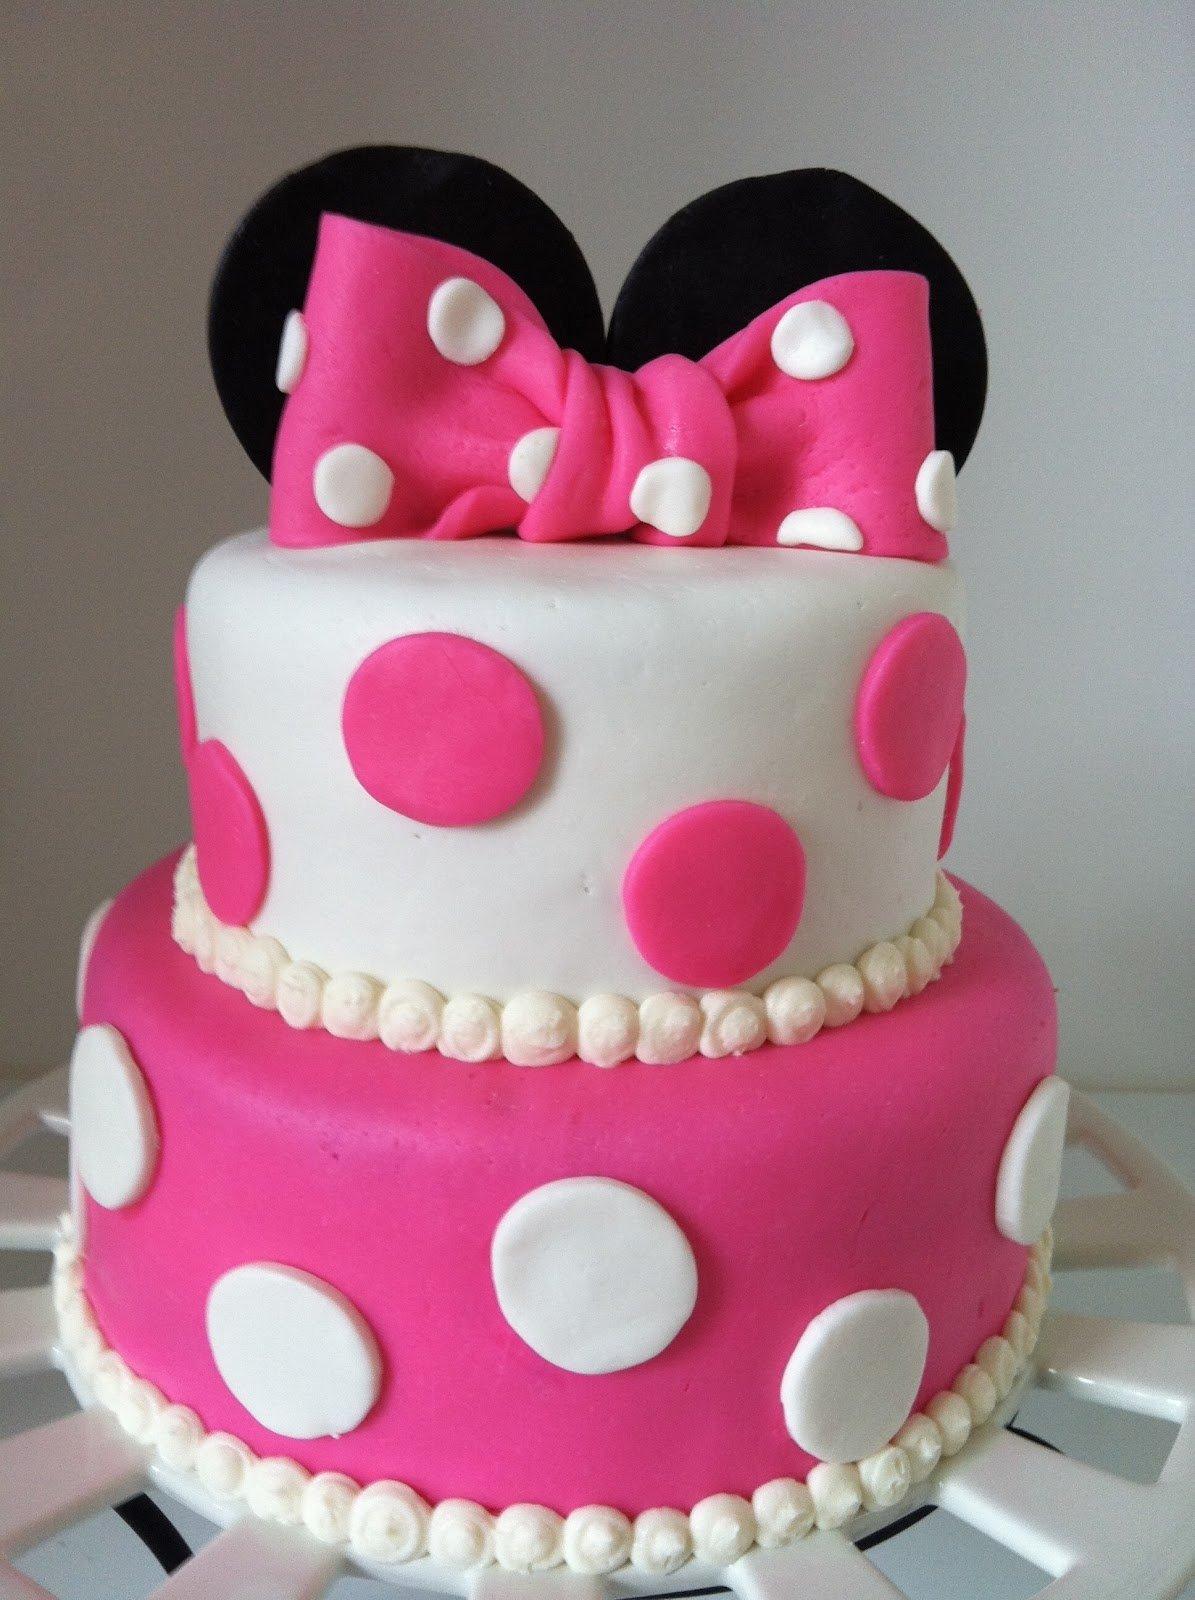 10 Amazing Little Girl Birthday Cake Ideas